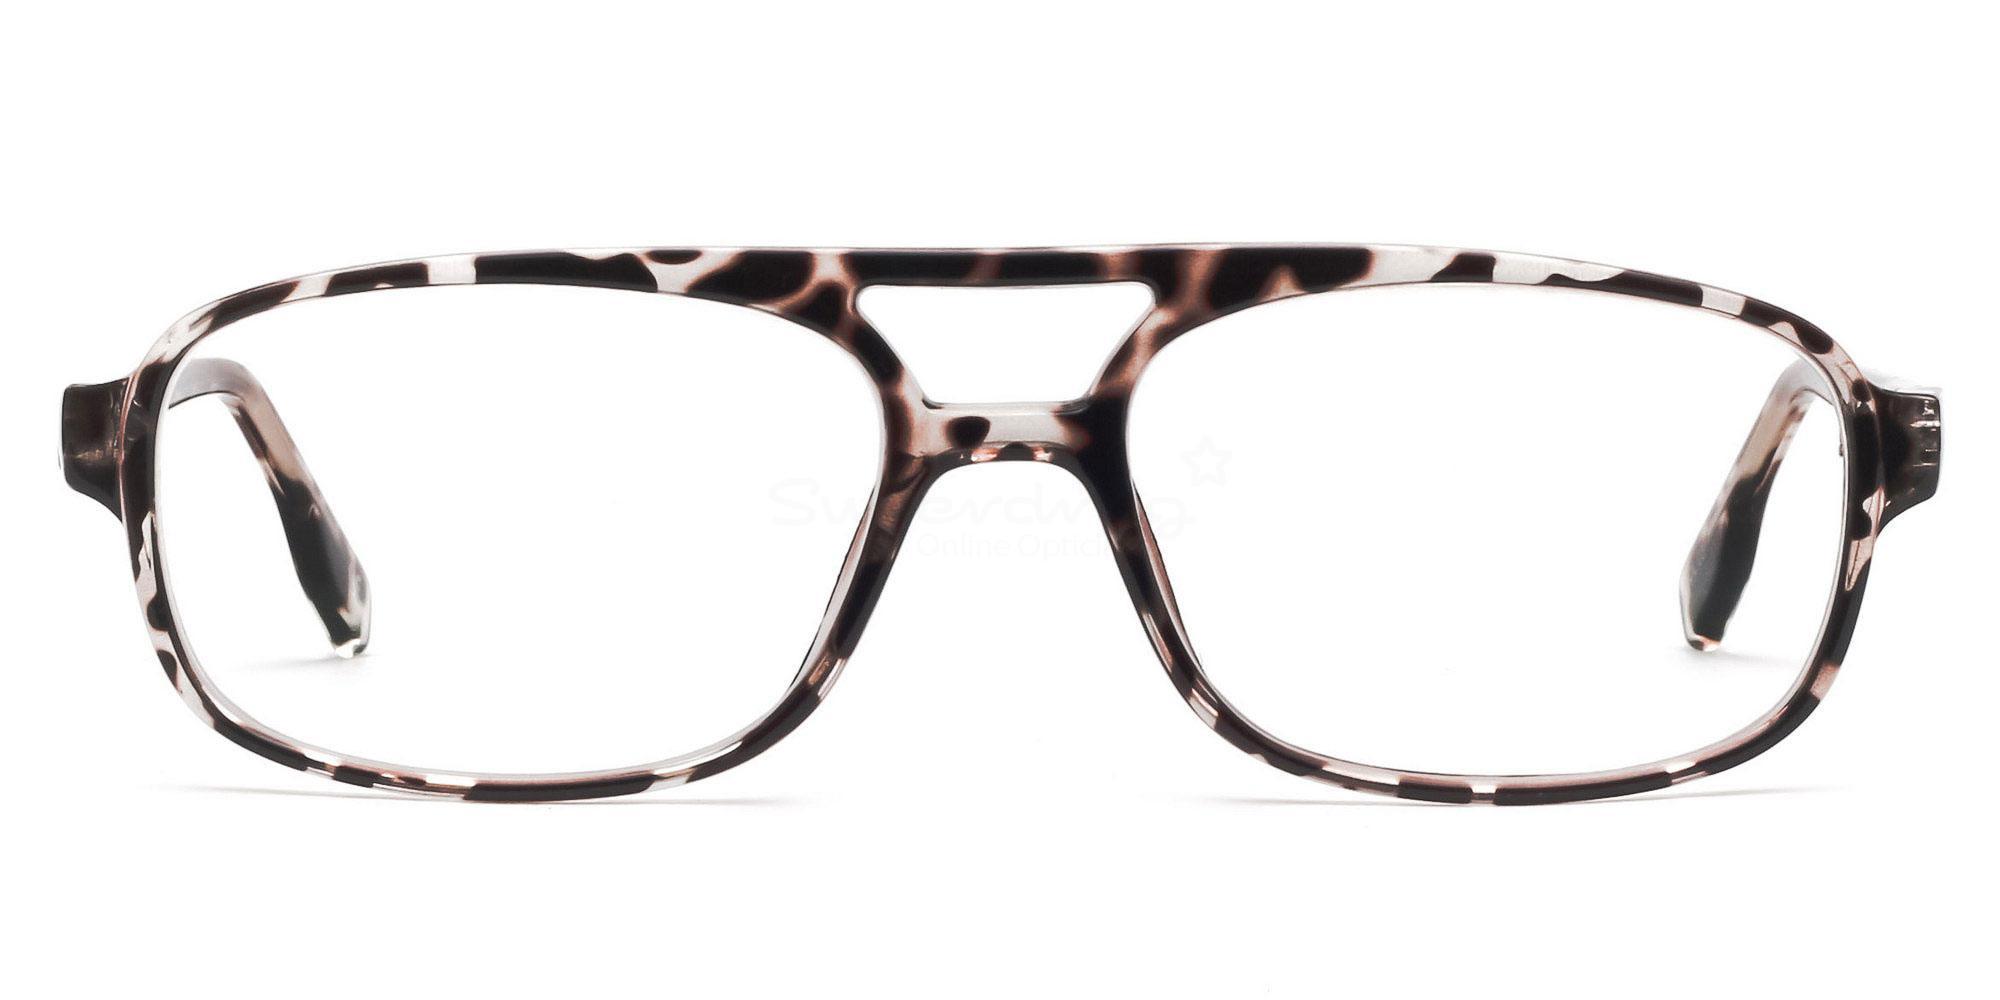 C3 P2395 - Animal Print Glasses, Helium